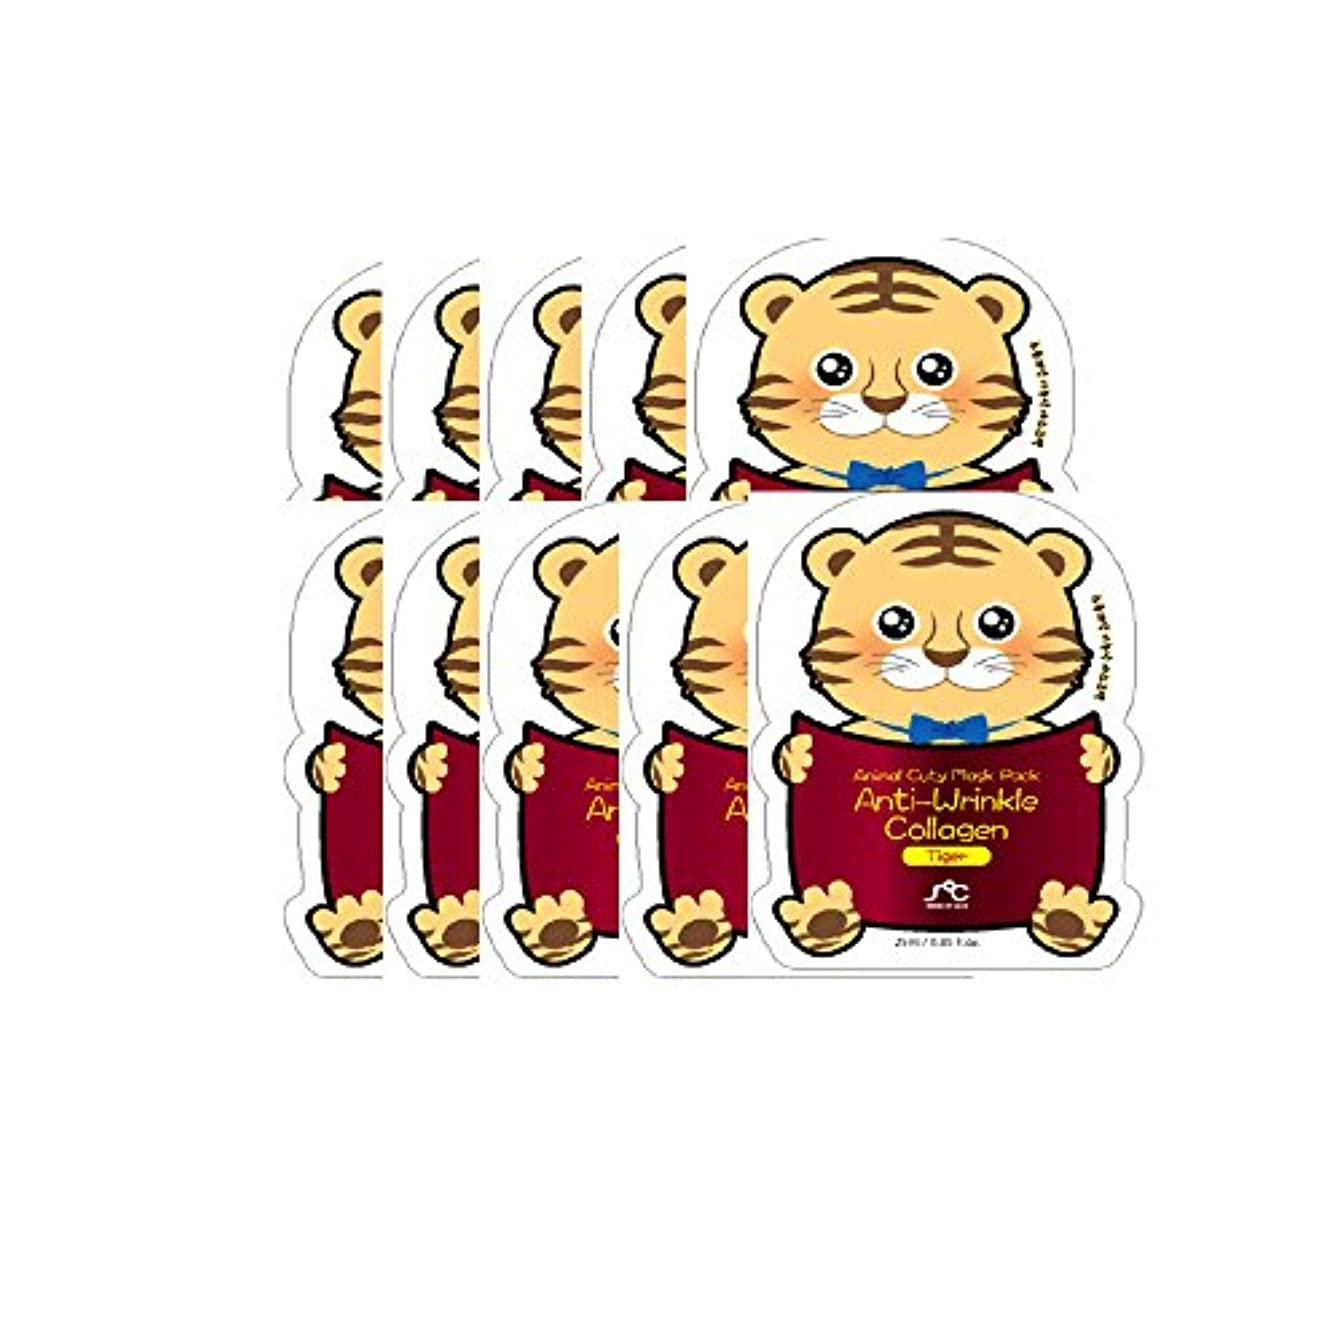 Asamo 動物キューティーマスクパックアンチリンクルコラーゲンタイガー(10枚)